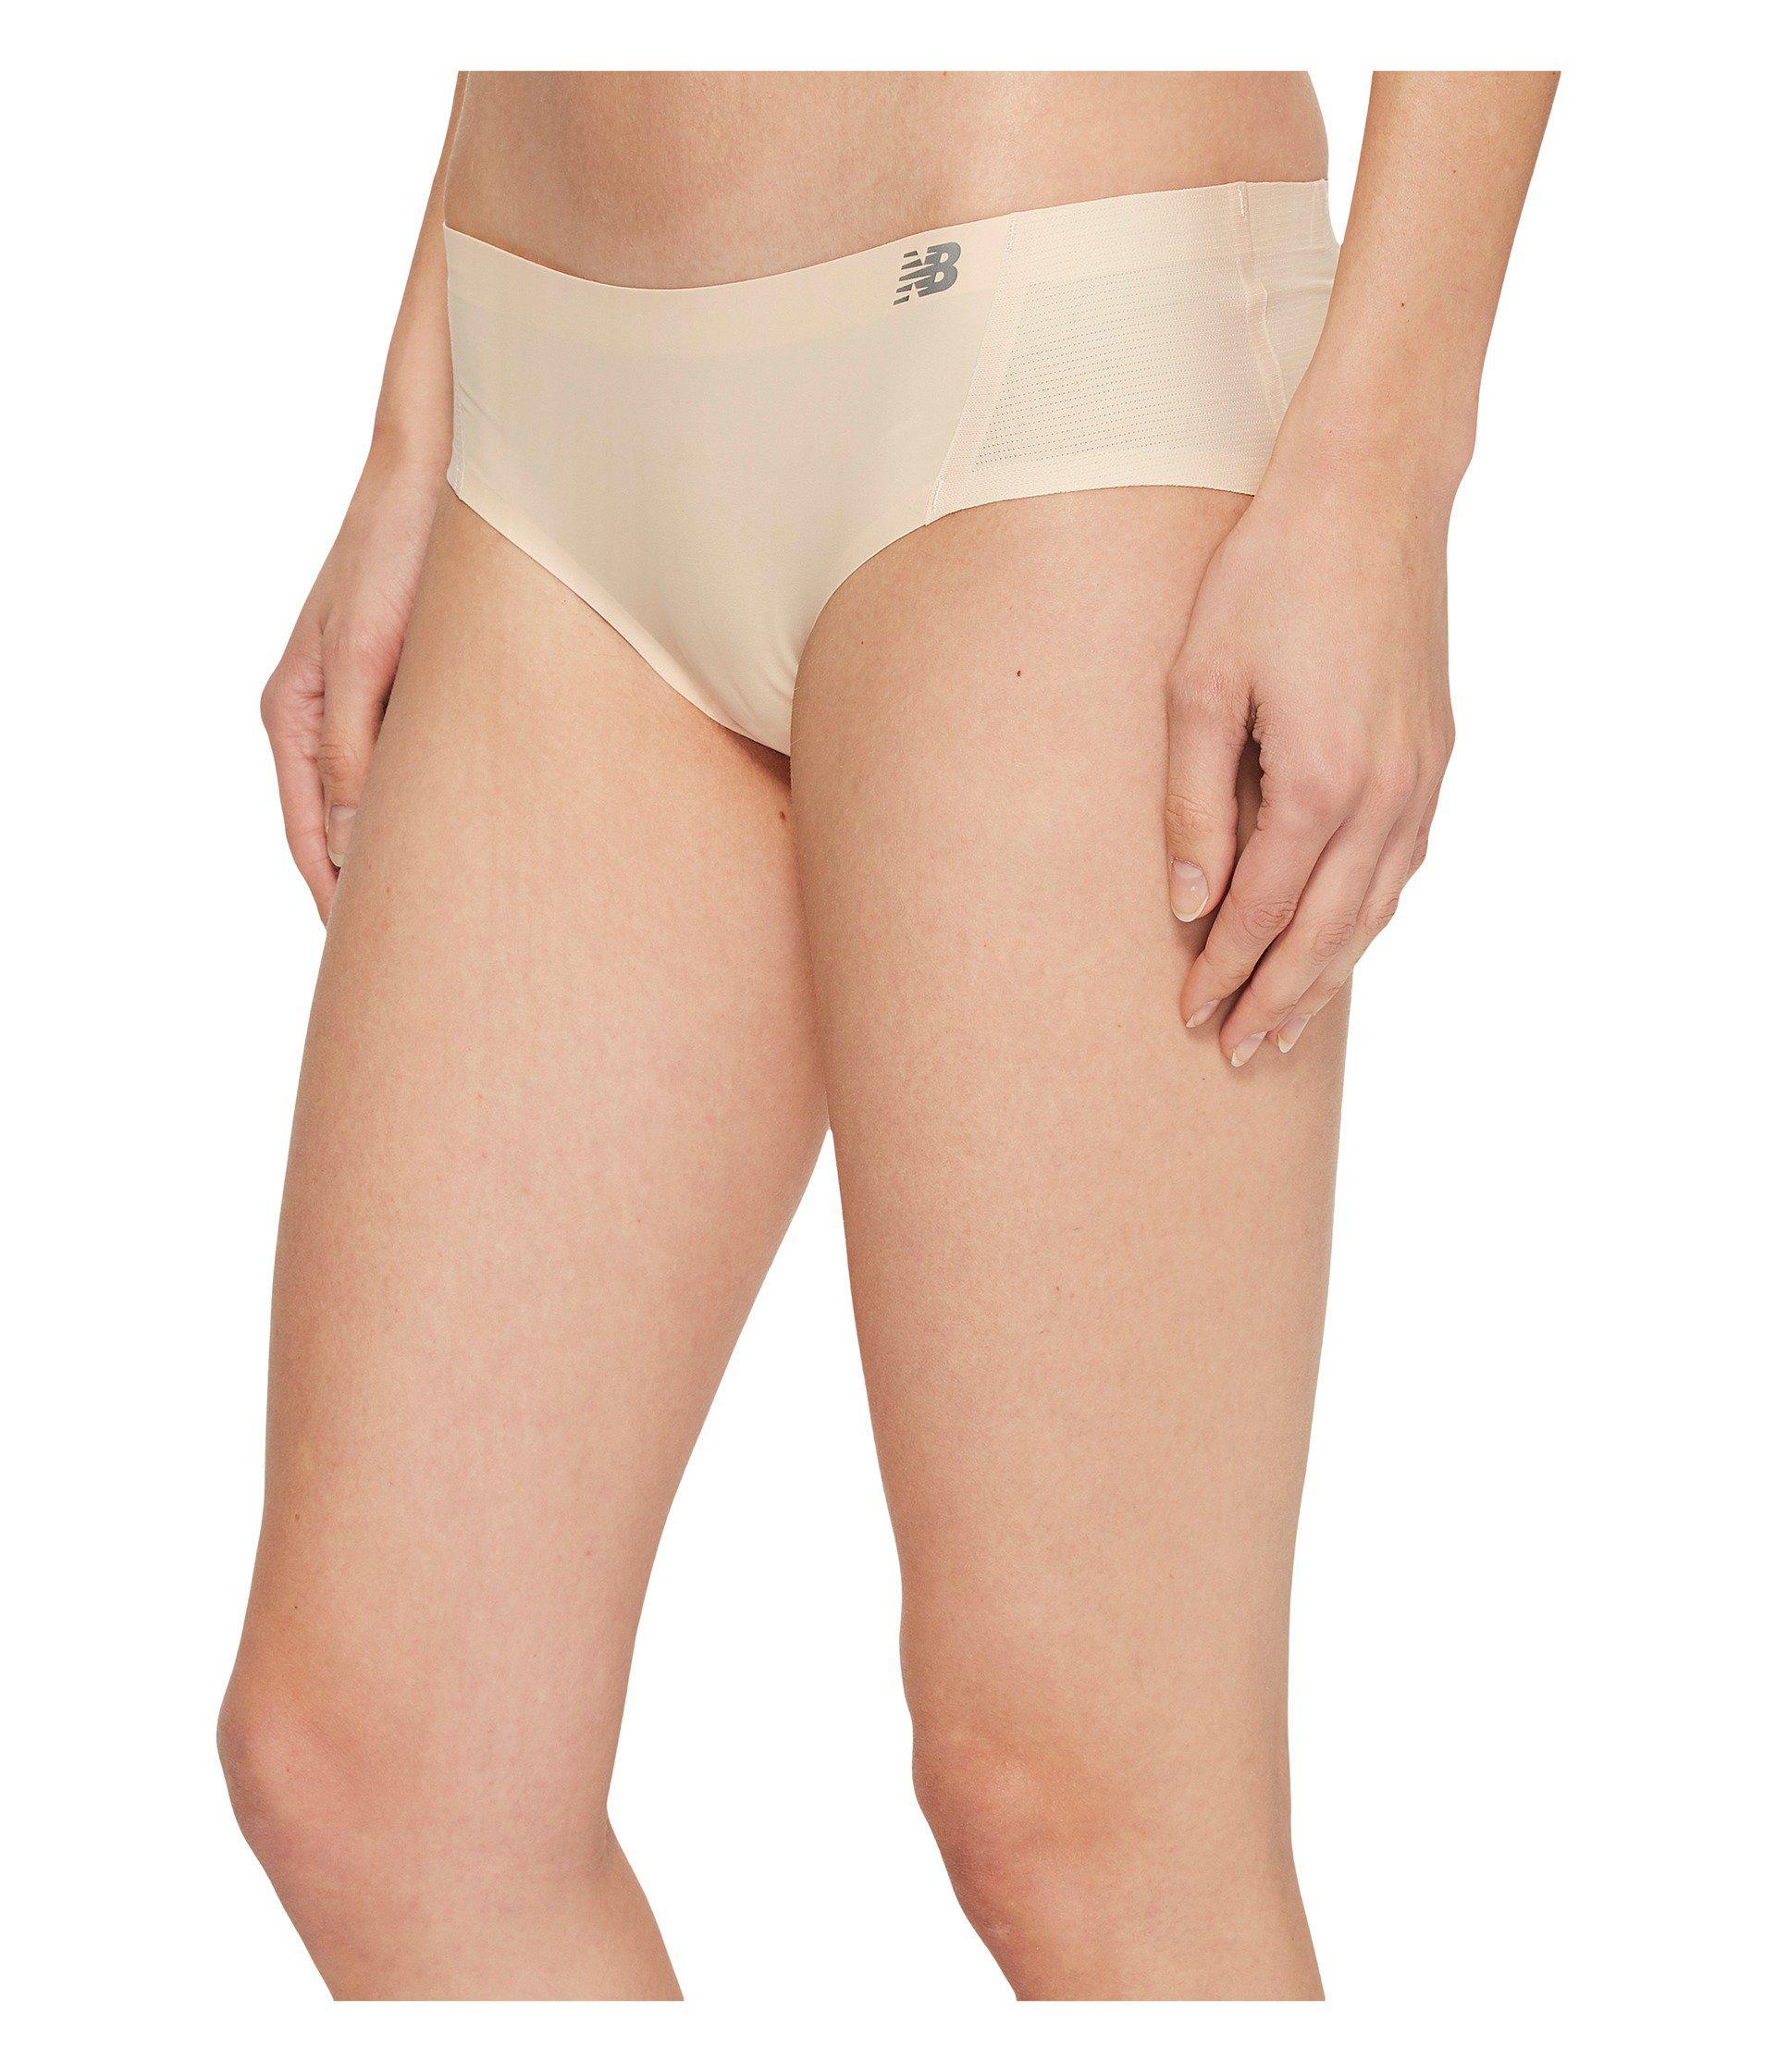 NEW BALANCE Women/'s Thong Panties 2 Pack Medium Black Naked Gym NB New